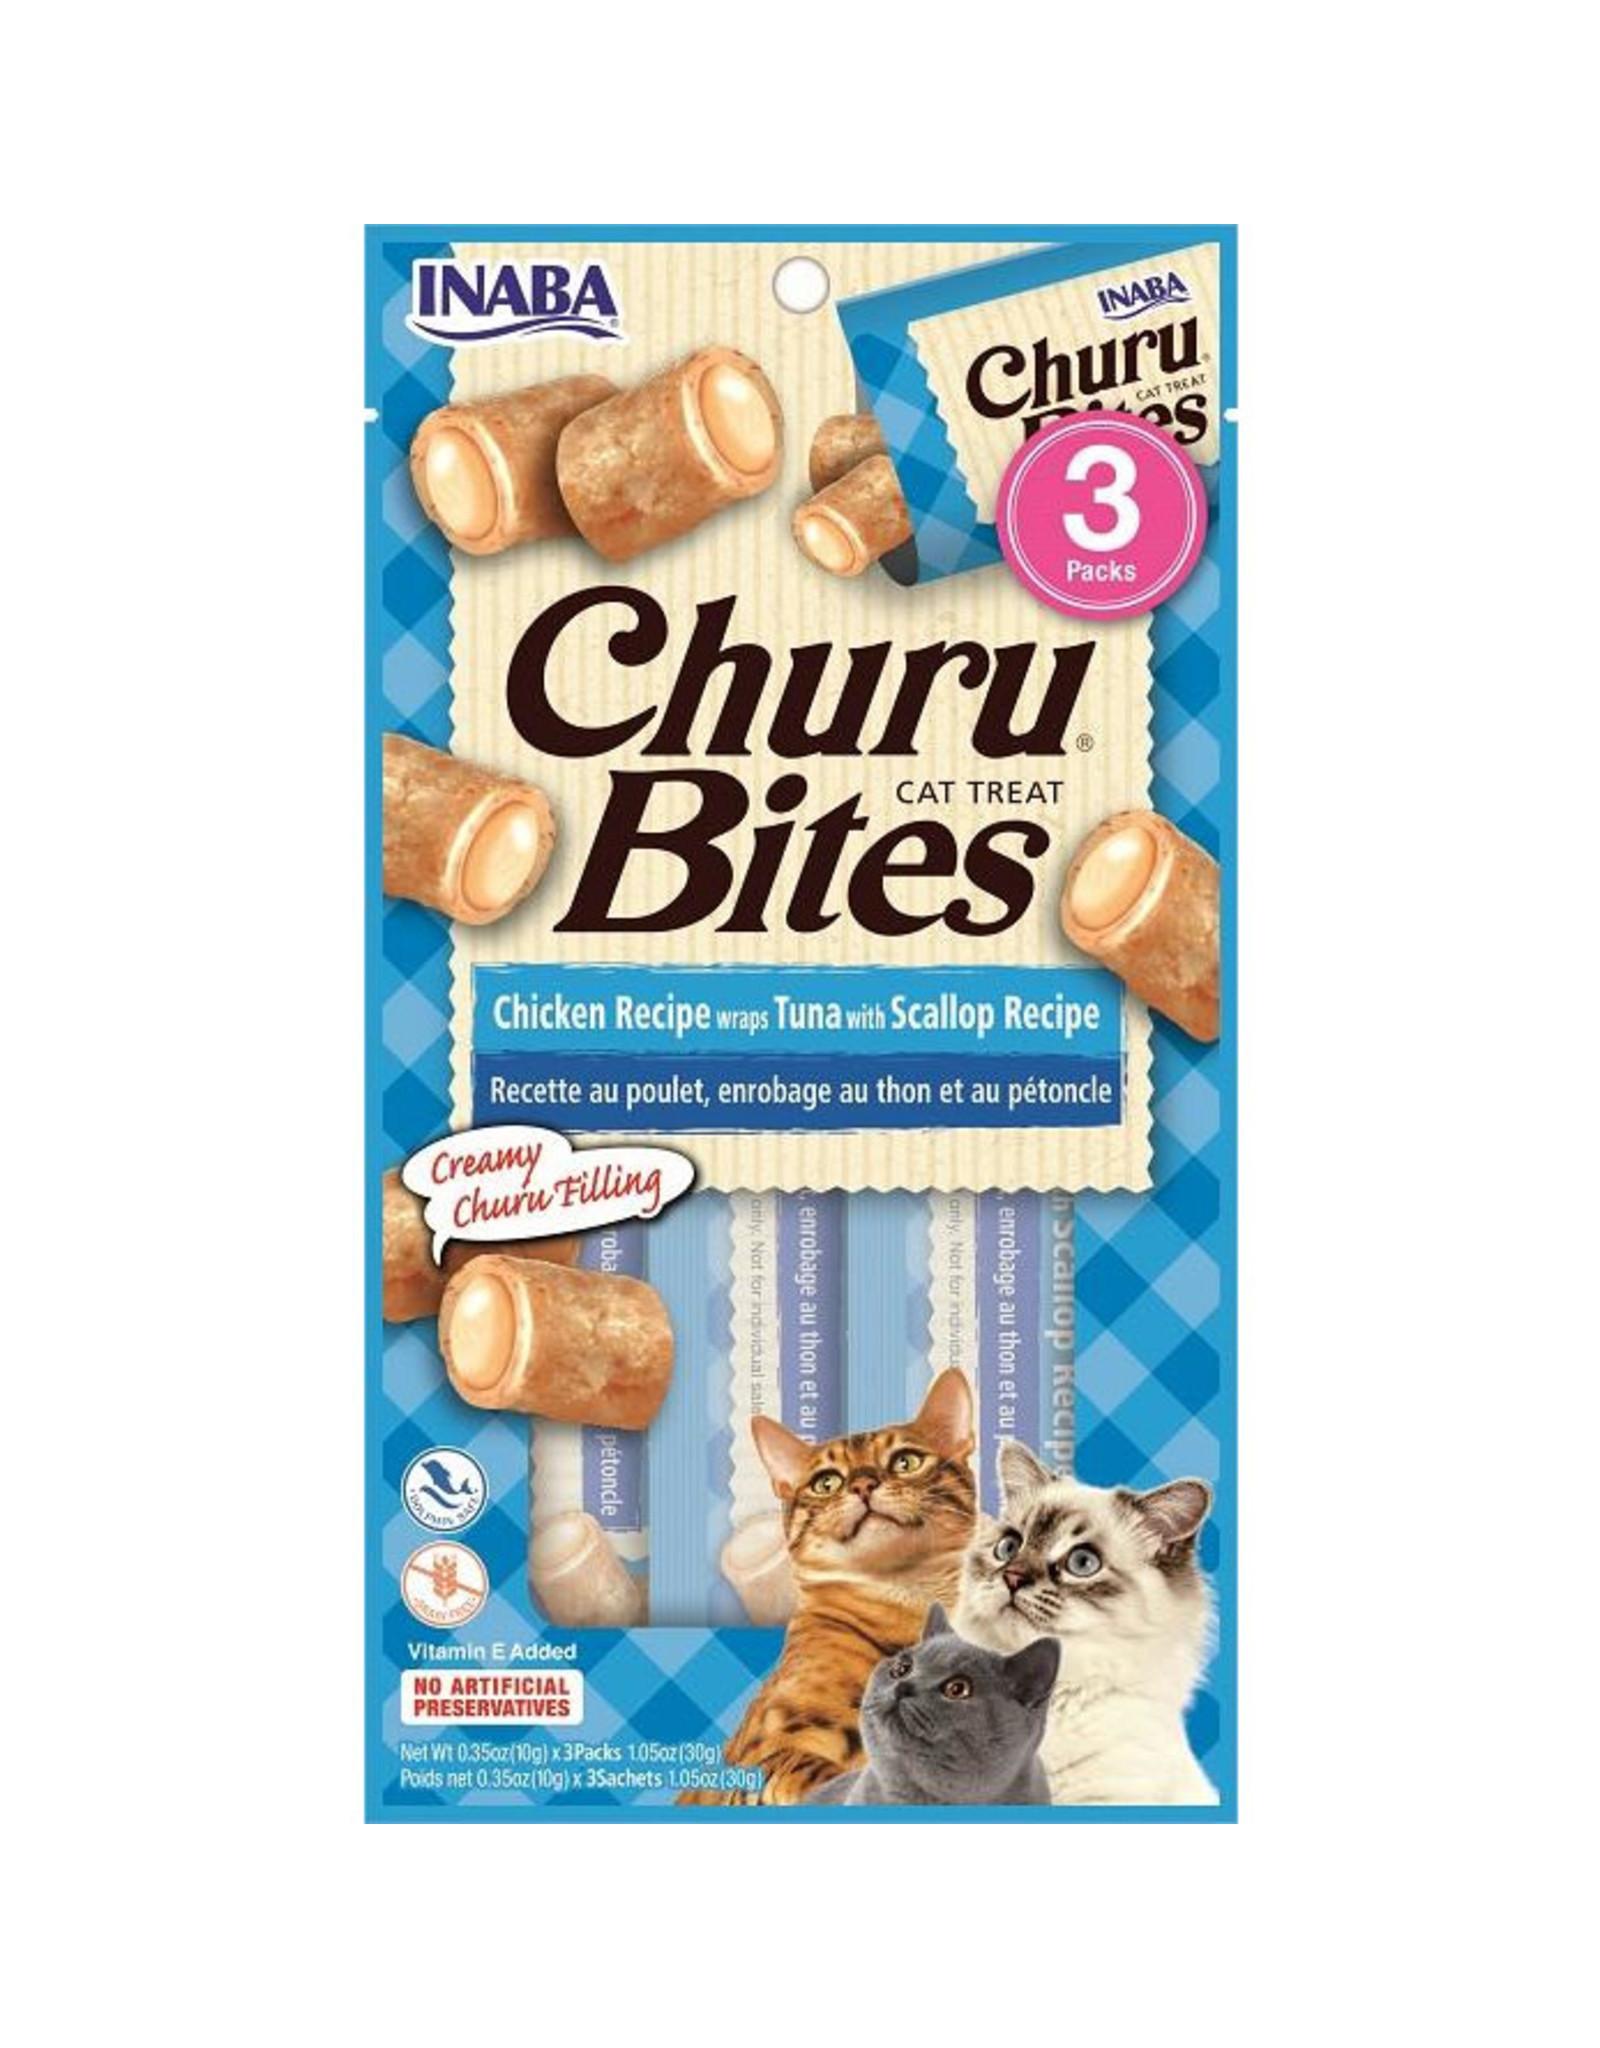 Inaba Inaba Churu Bites Chicken Recipe Wraps Tuna w/Scallop Recipe Cat Treats 3 pack